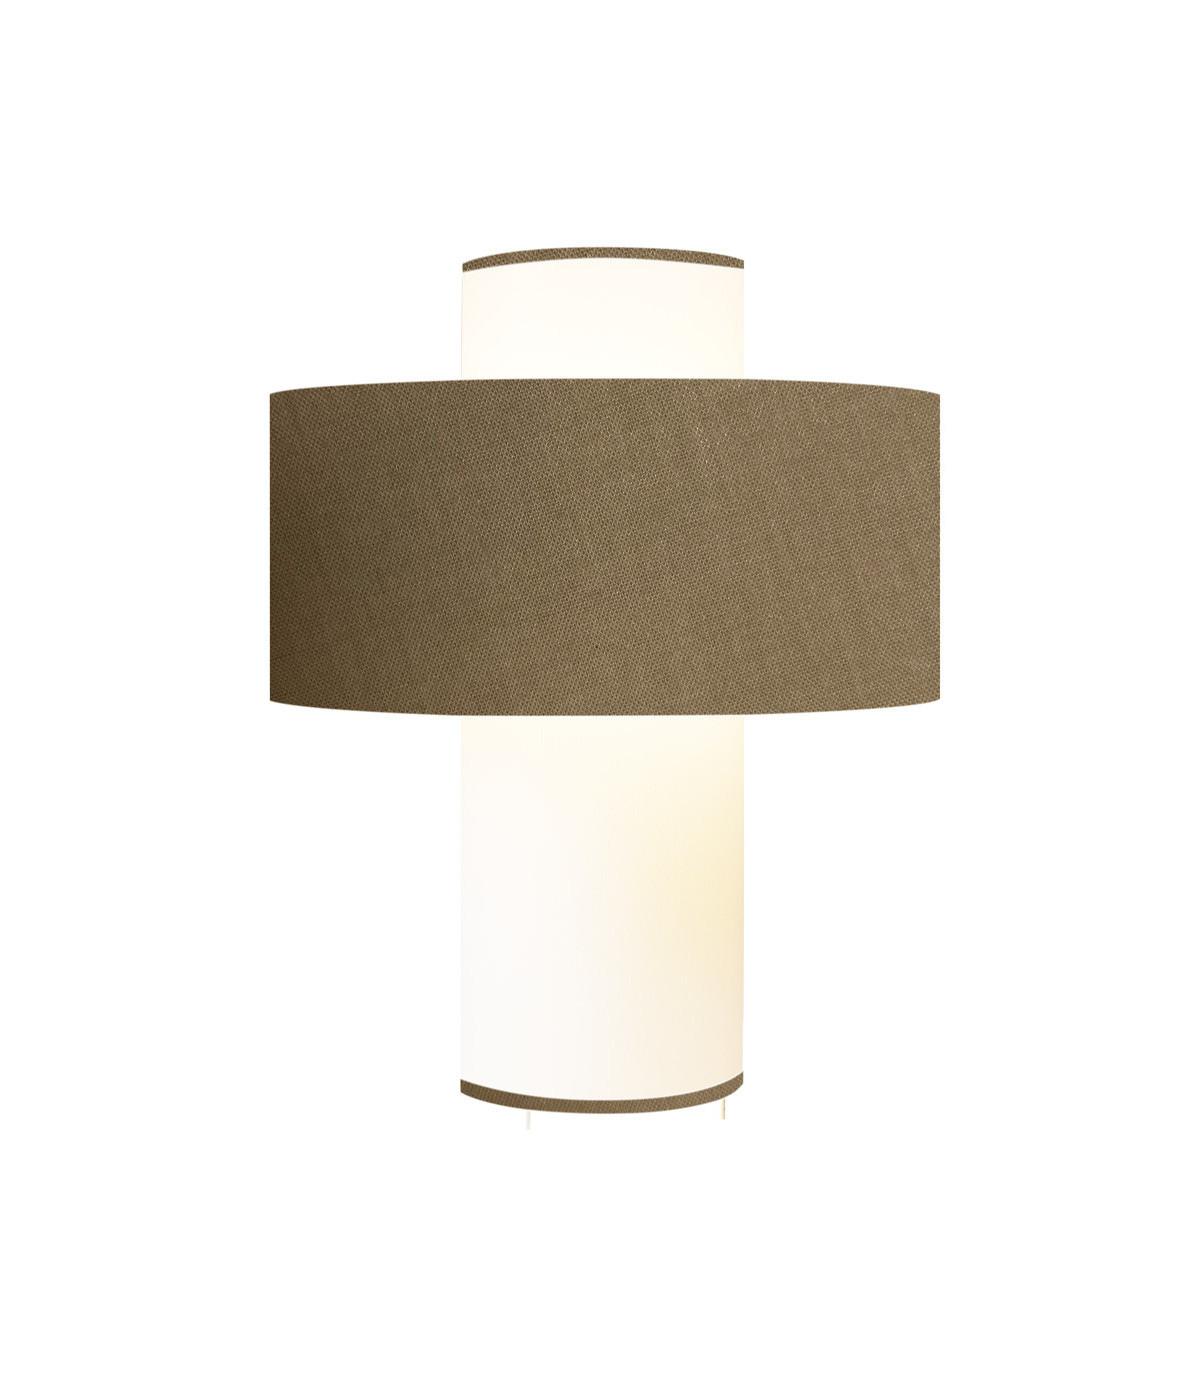 Lampe taupe D 35 cm